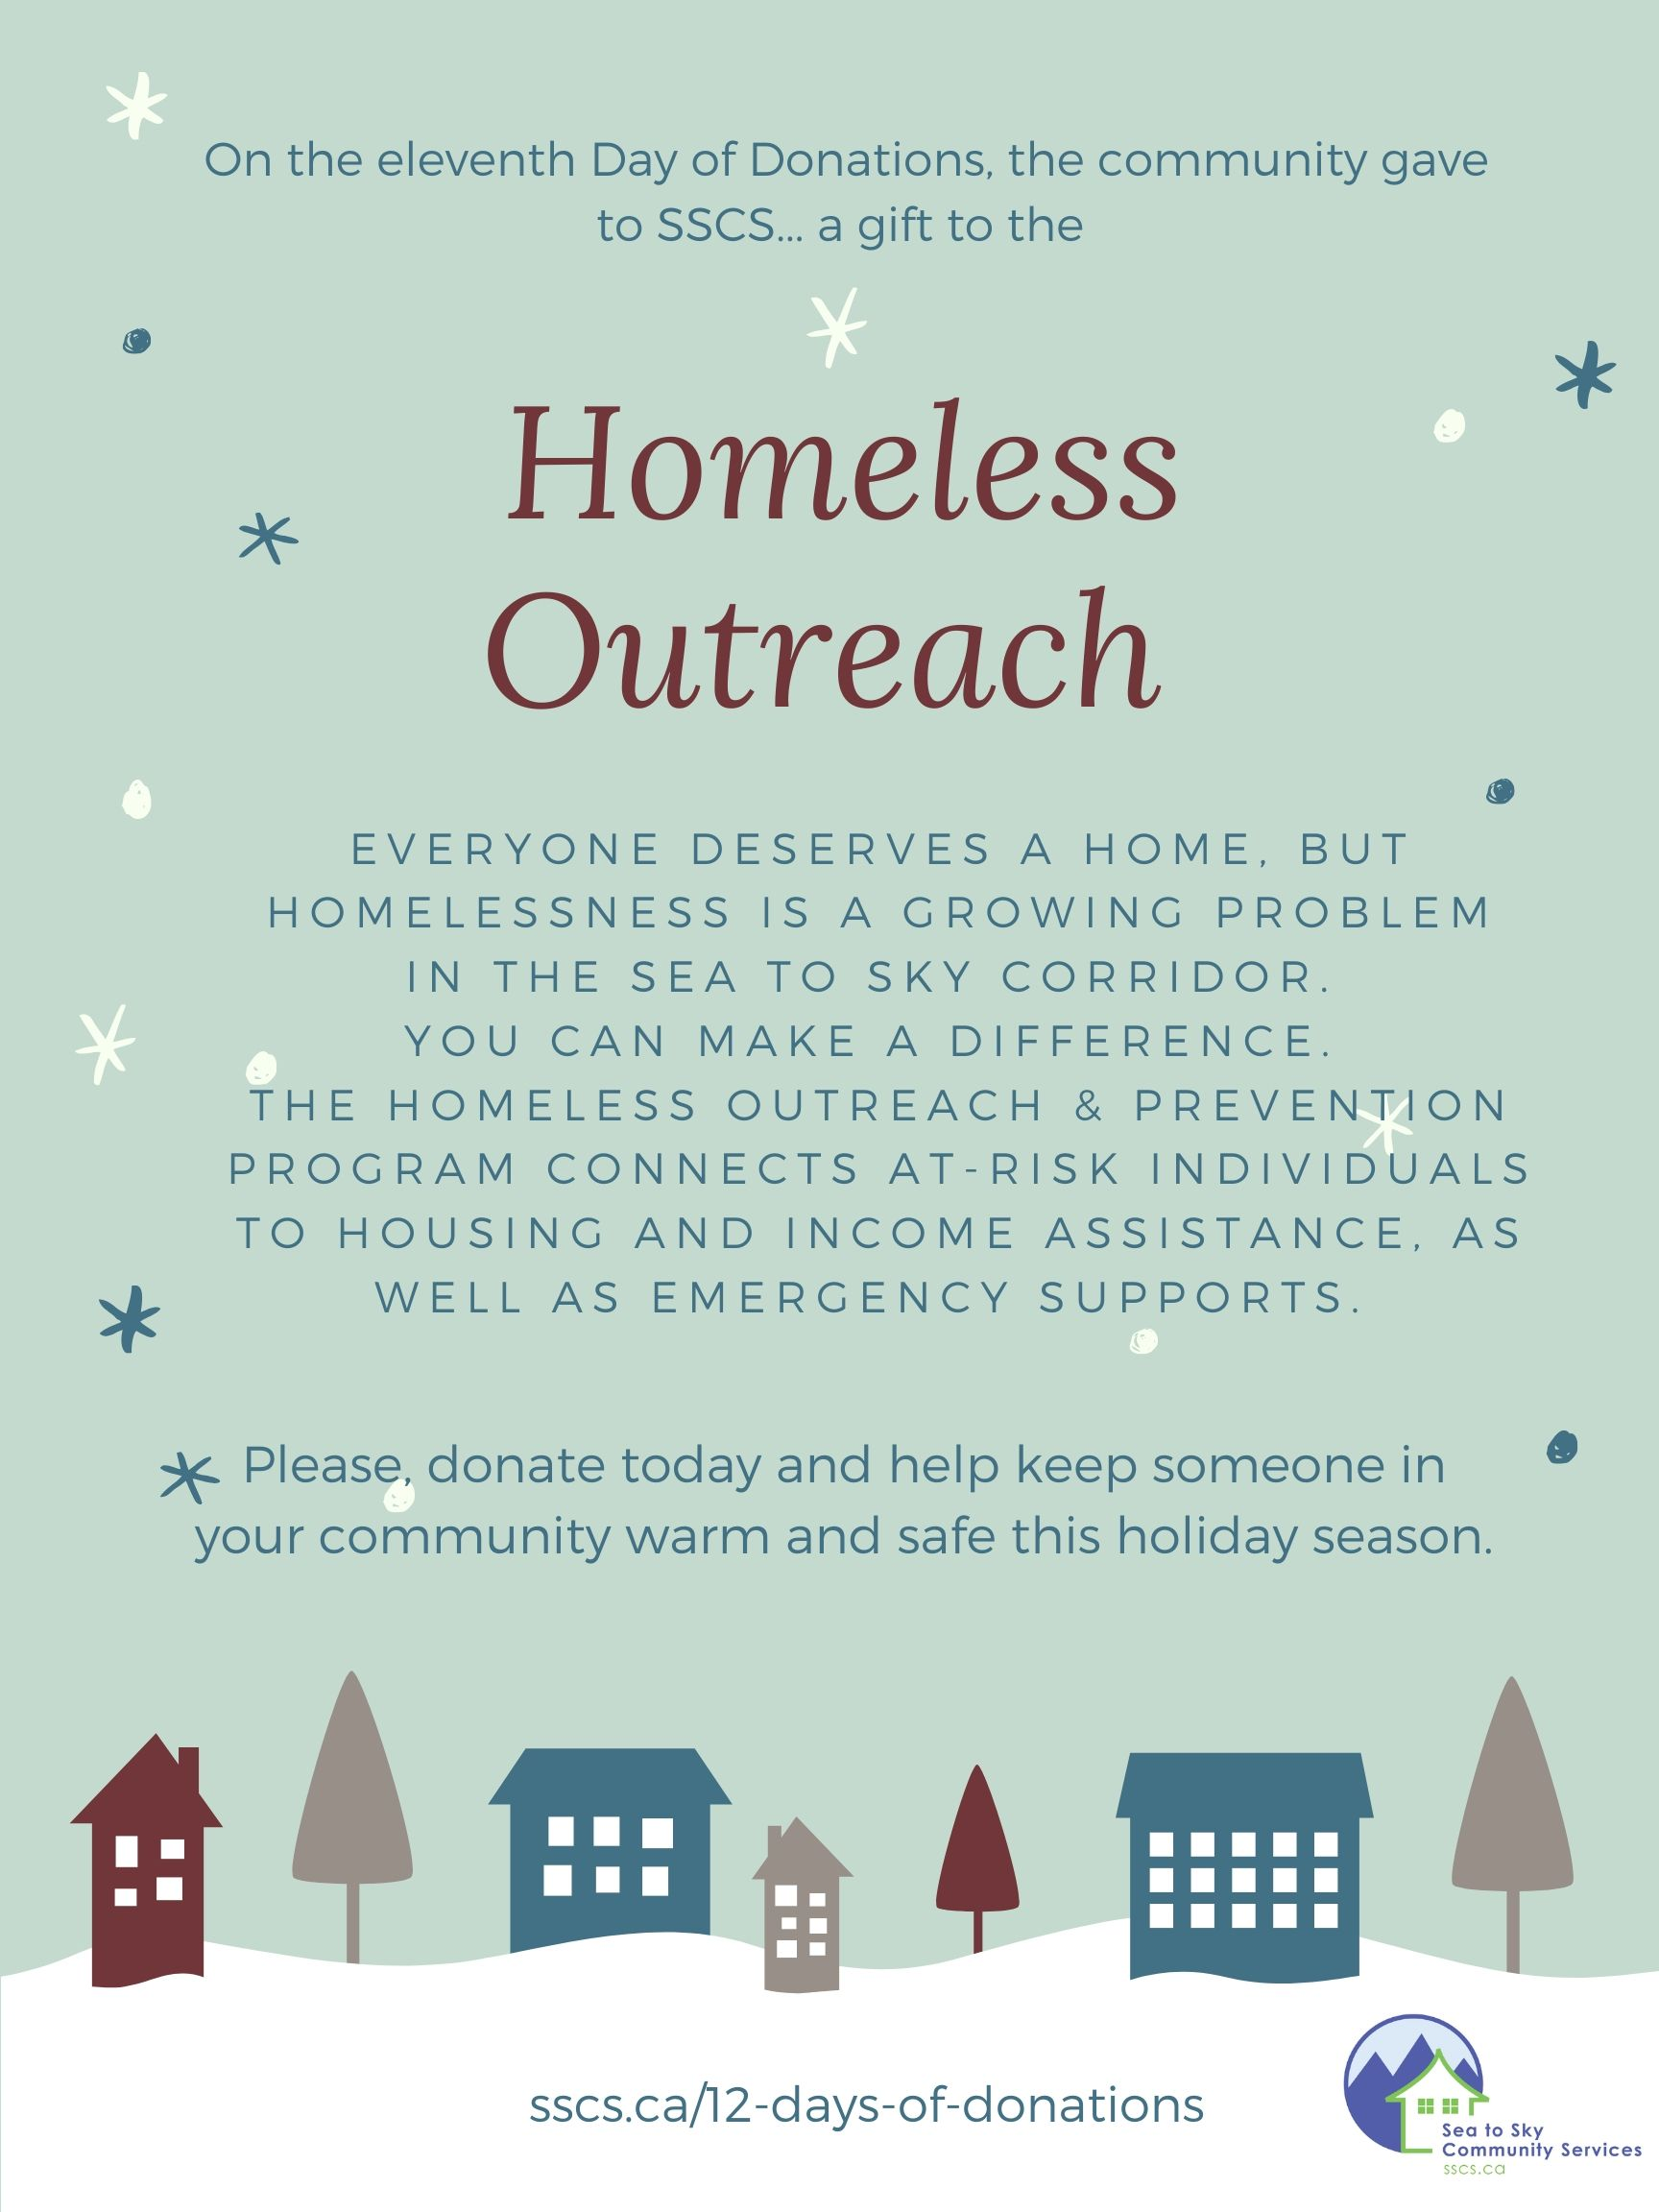 Day 11 - Homeless Outreach